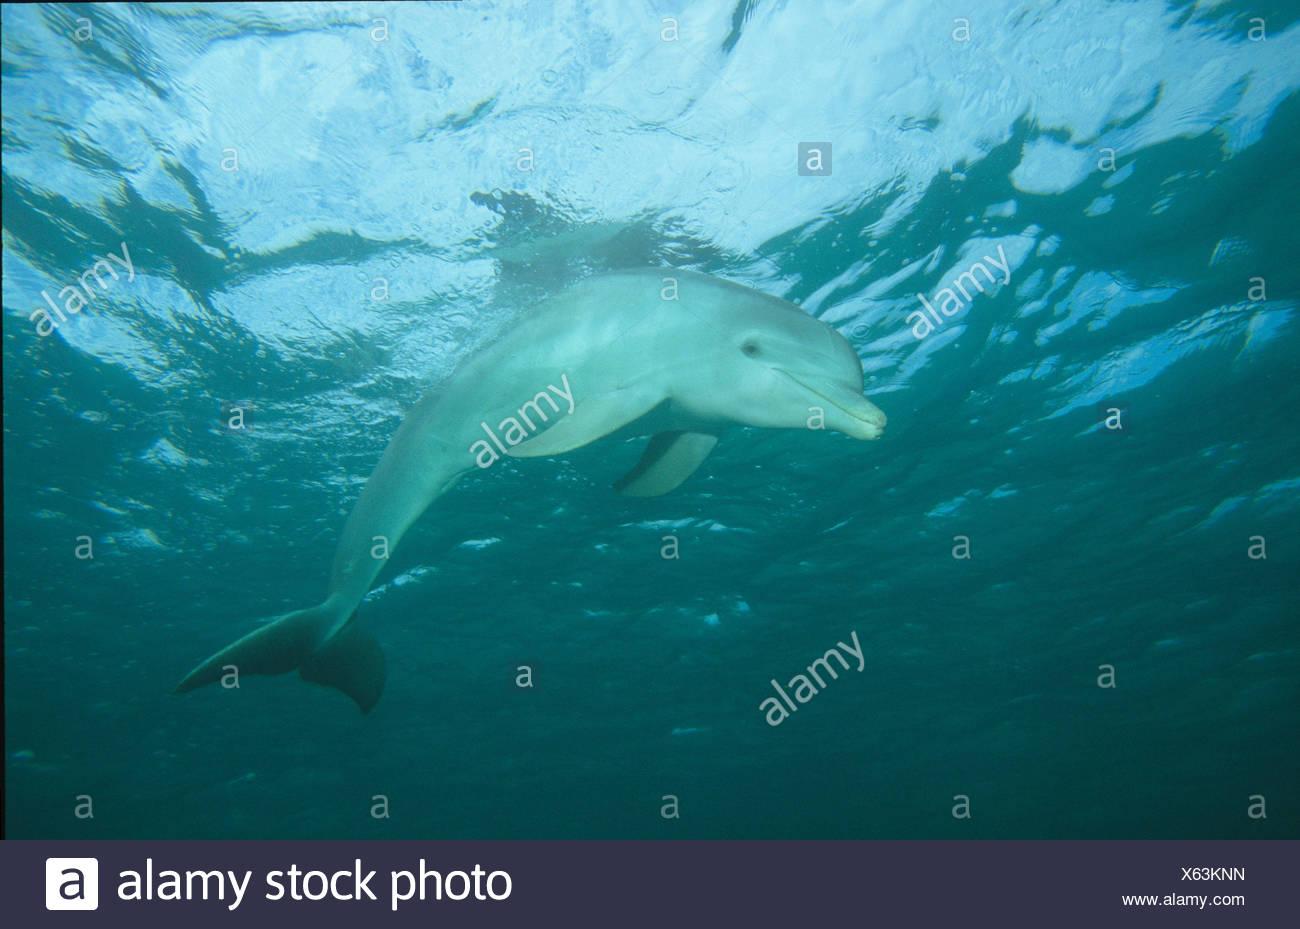 zoology, mammal / mammalian, dolphin (Delphinidae), Grand Bahama, Bahamas, Additional-Rights-Clearance-Info-Not-Available - Stock Image